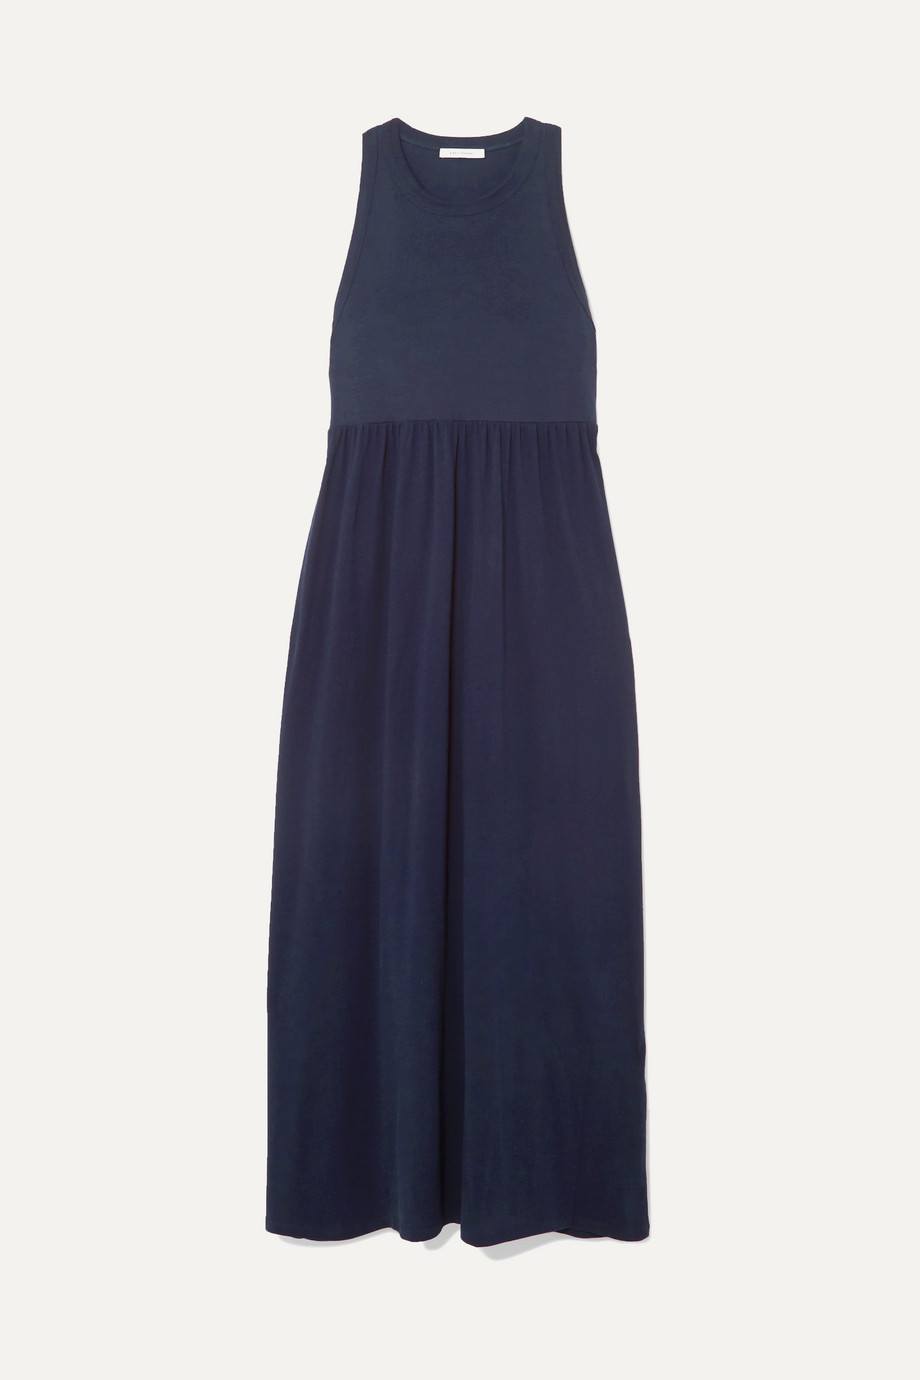 Ninety Percent   Organic cotton-jersey maxi dress   NET-A-PORTER.COM